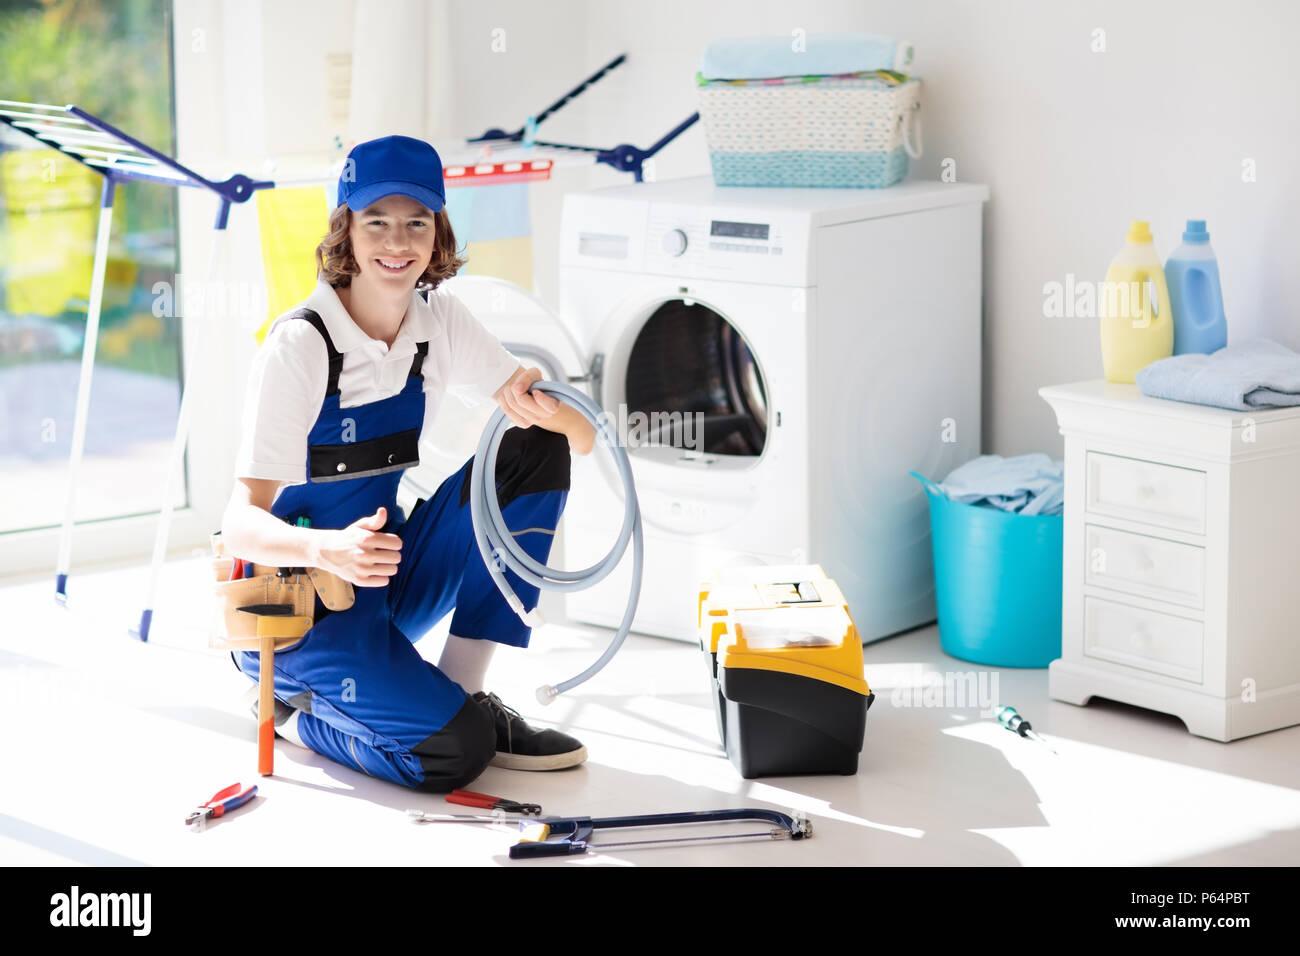 Washing machine repair service  Young male technician in blue